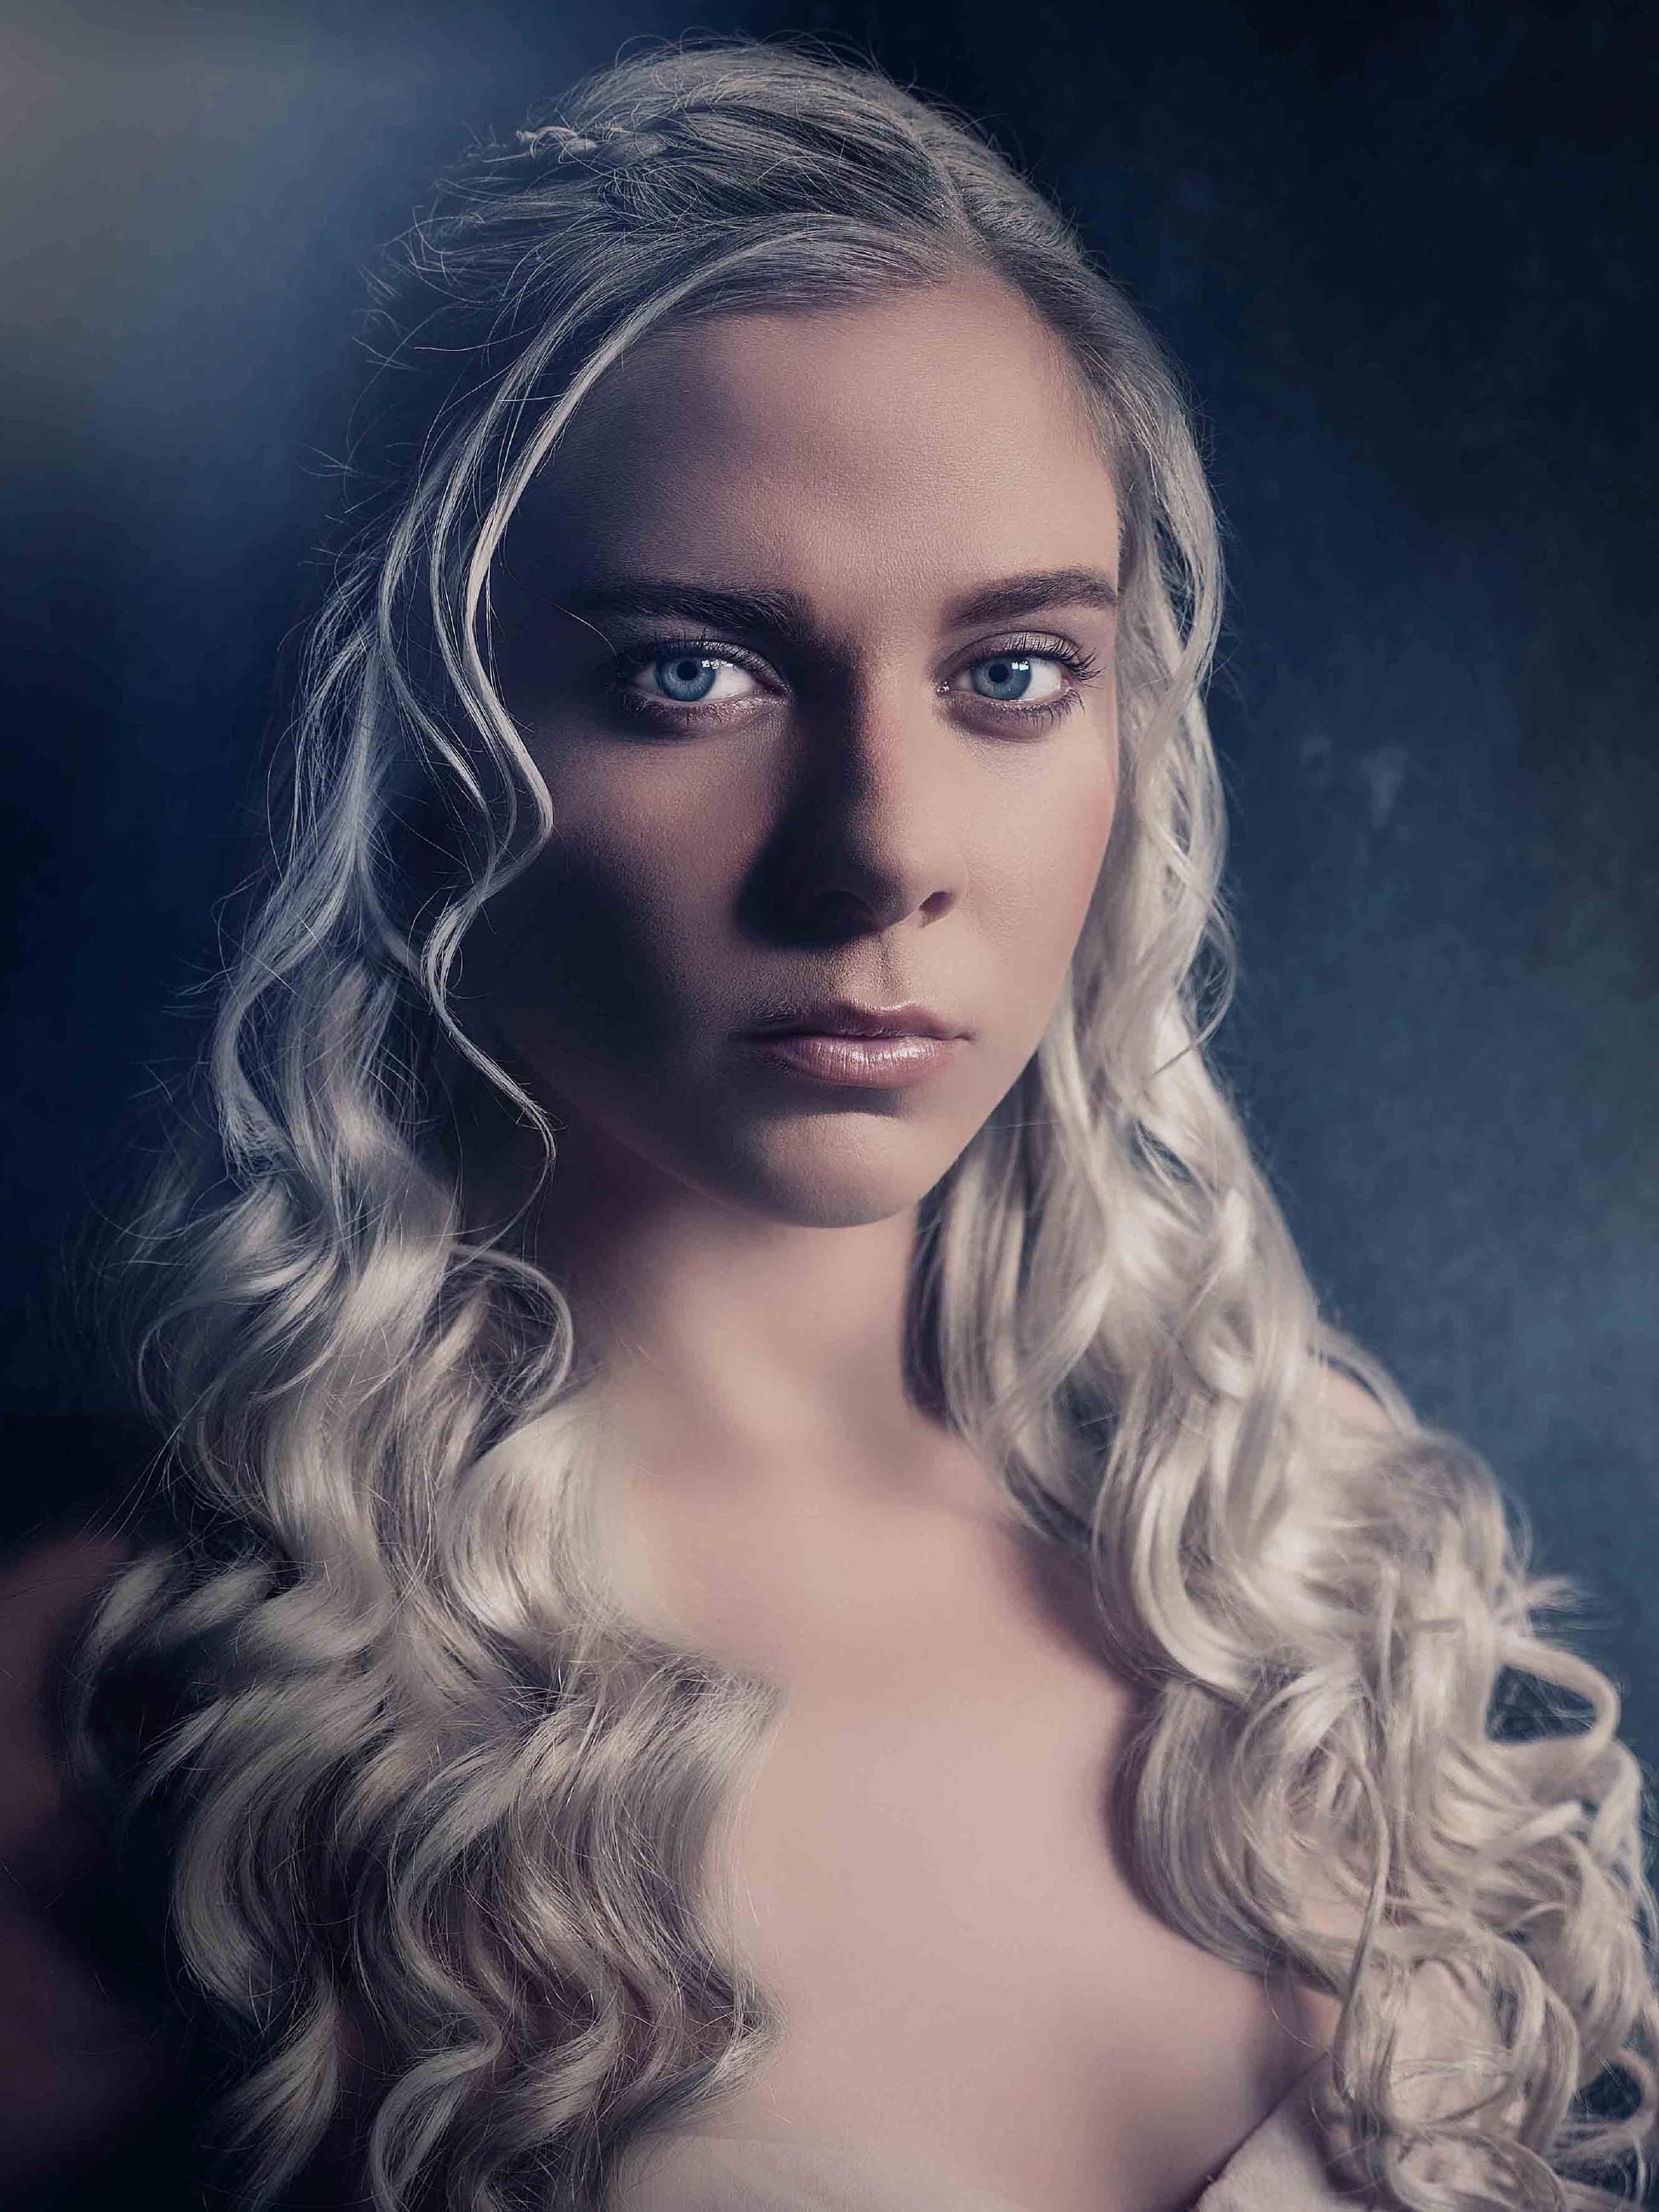 Cheyenne Pahde als Daenerys Targaryen